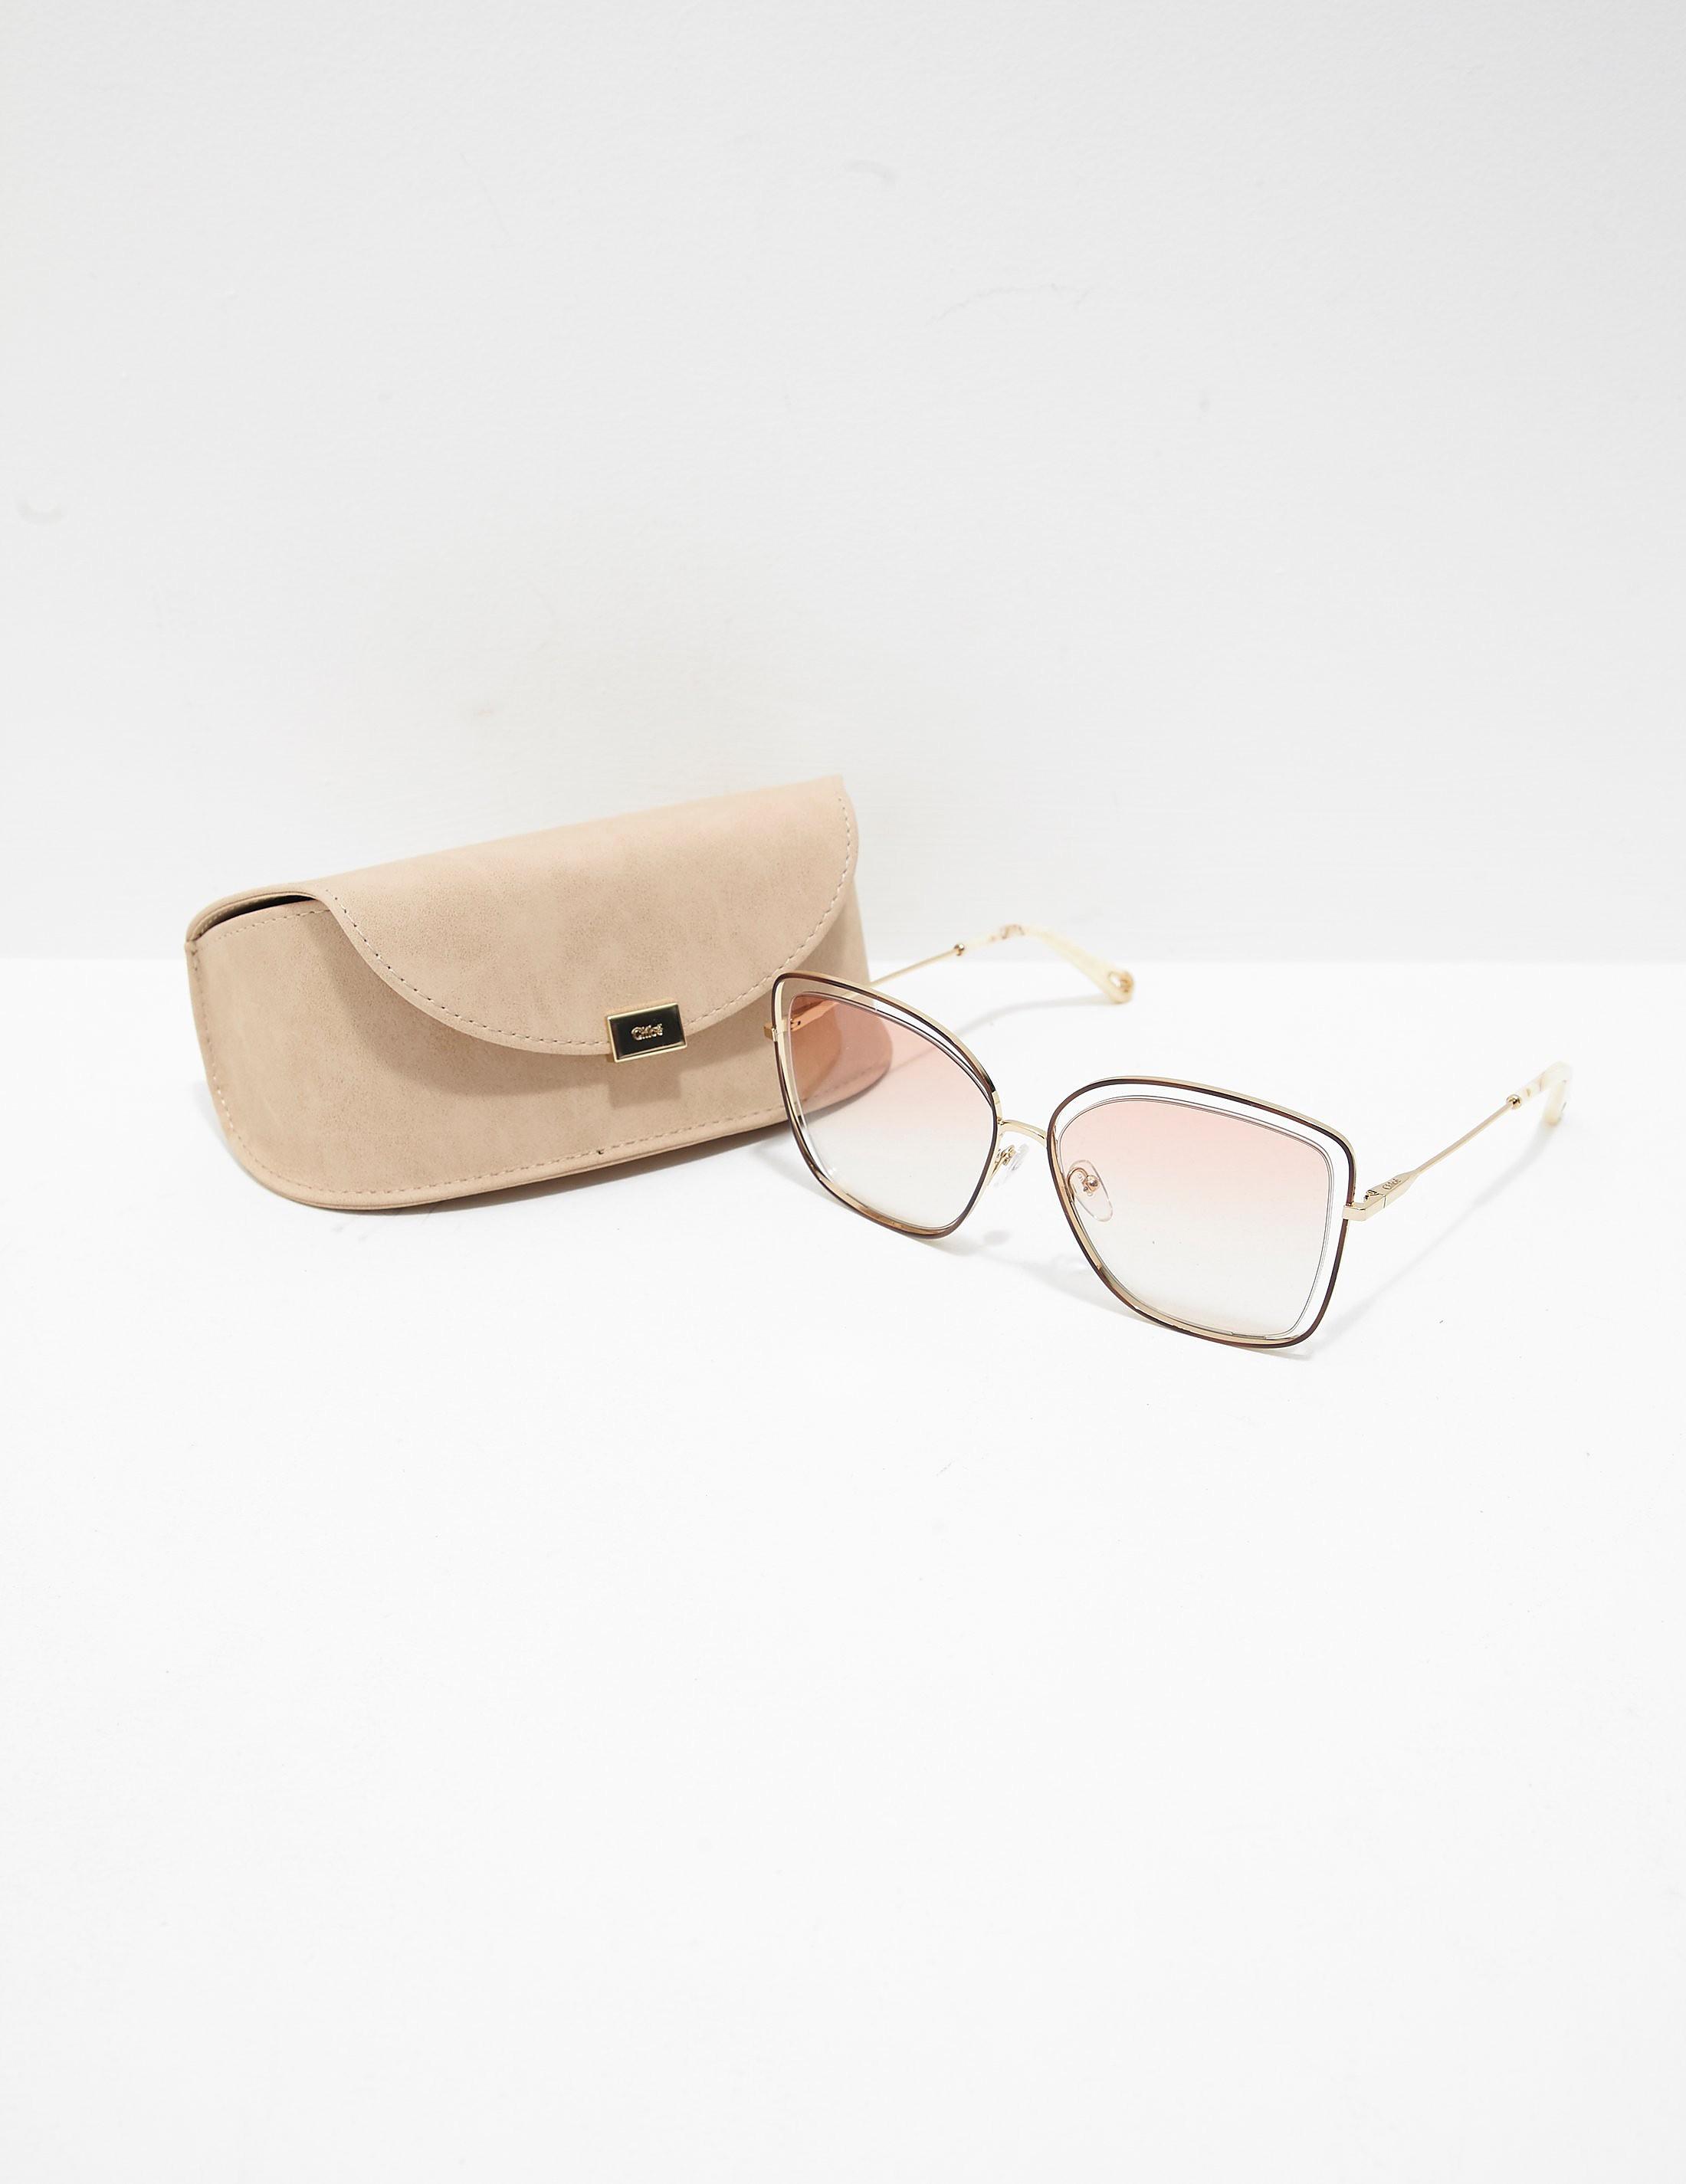 Chloe Square Metal Sunglasses